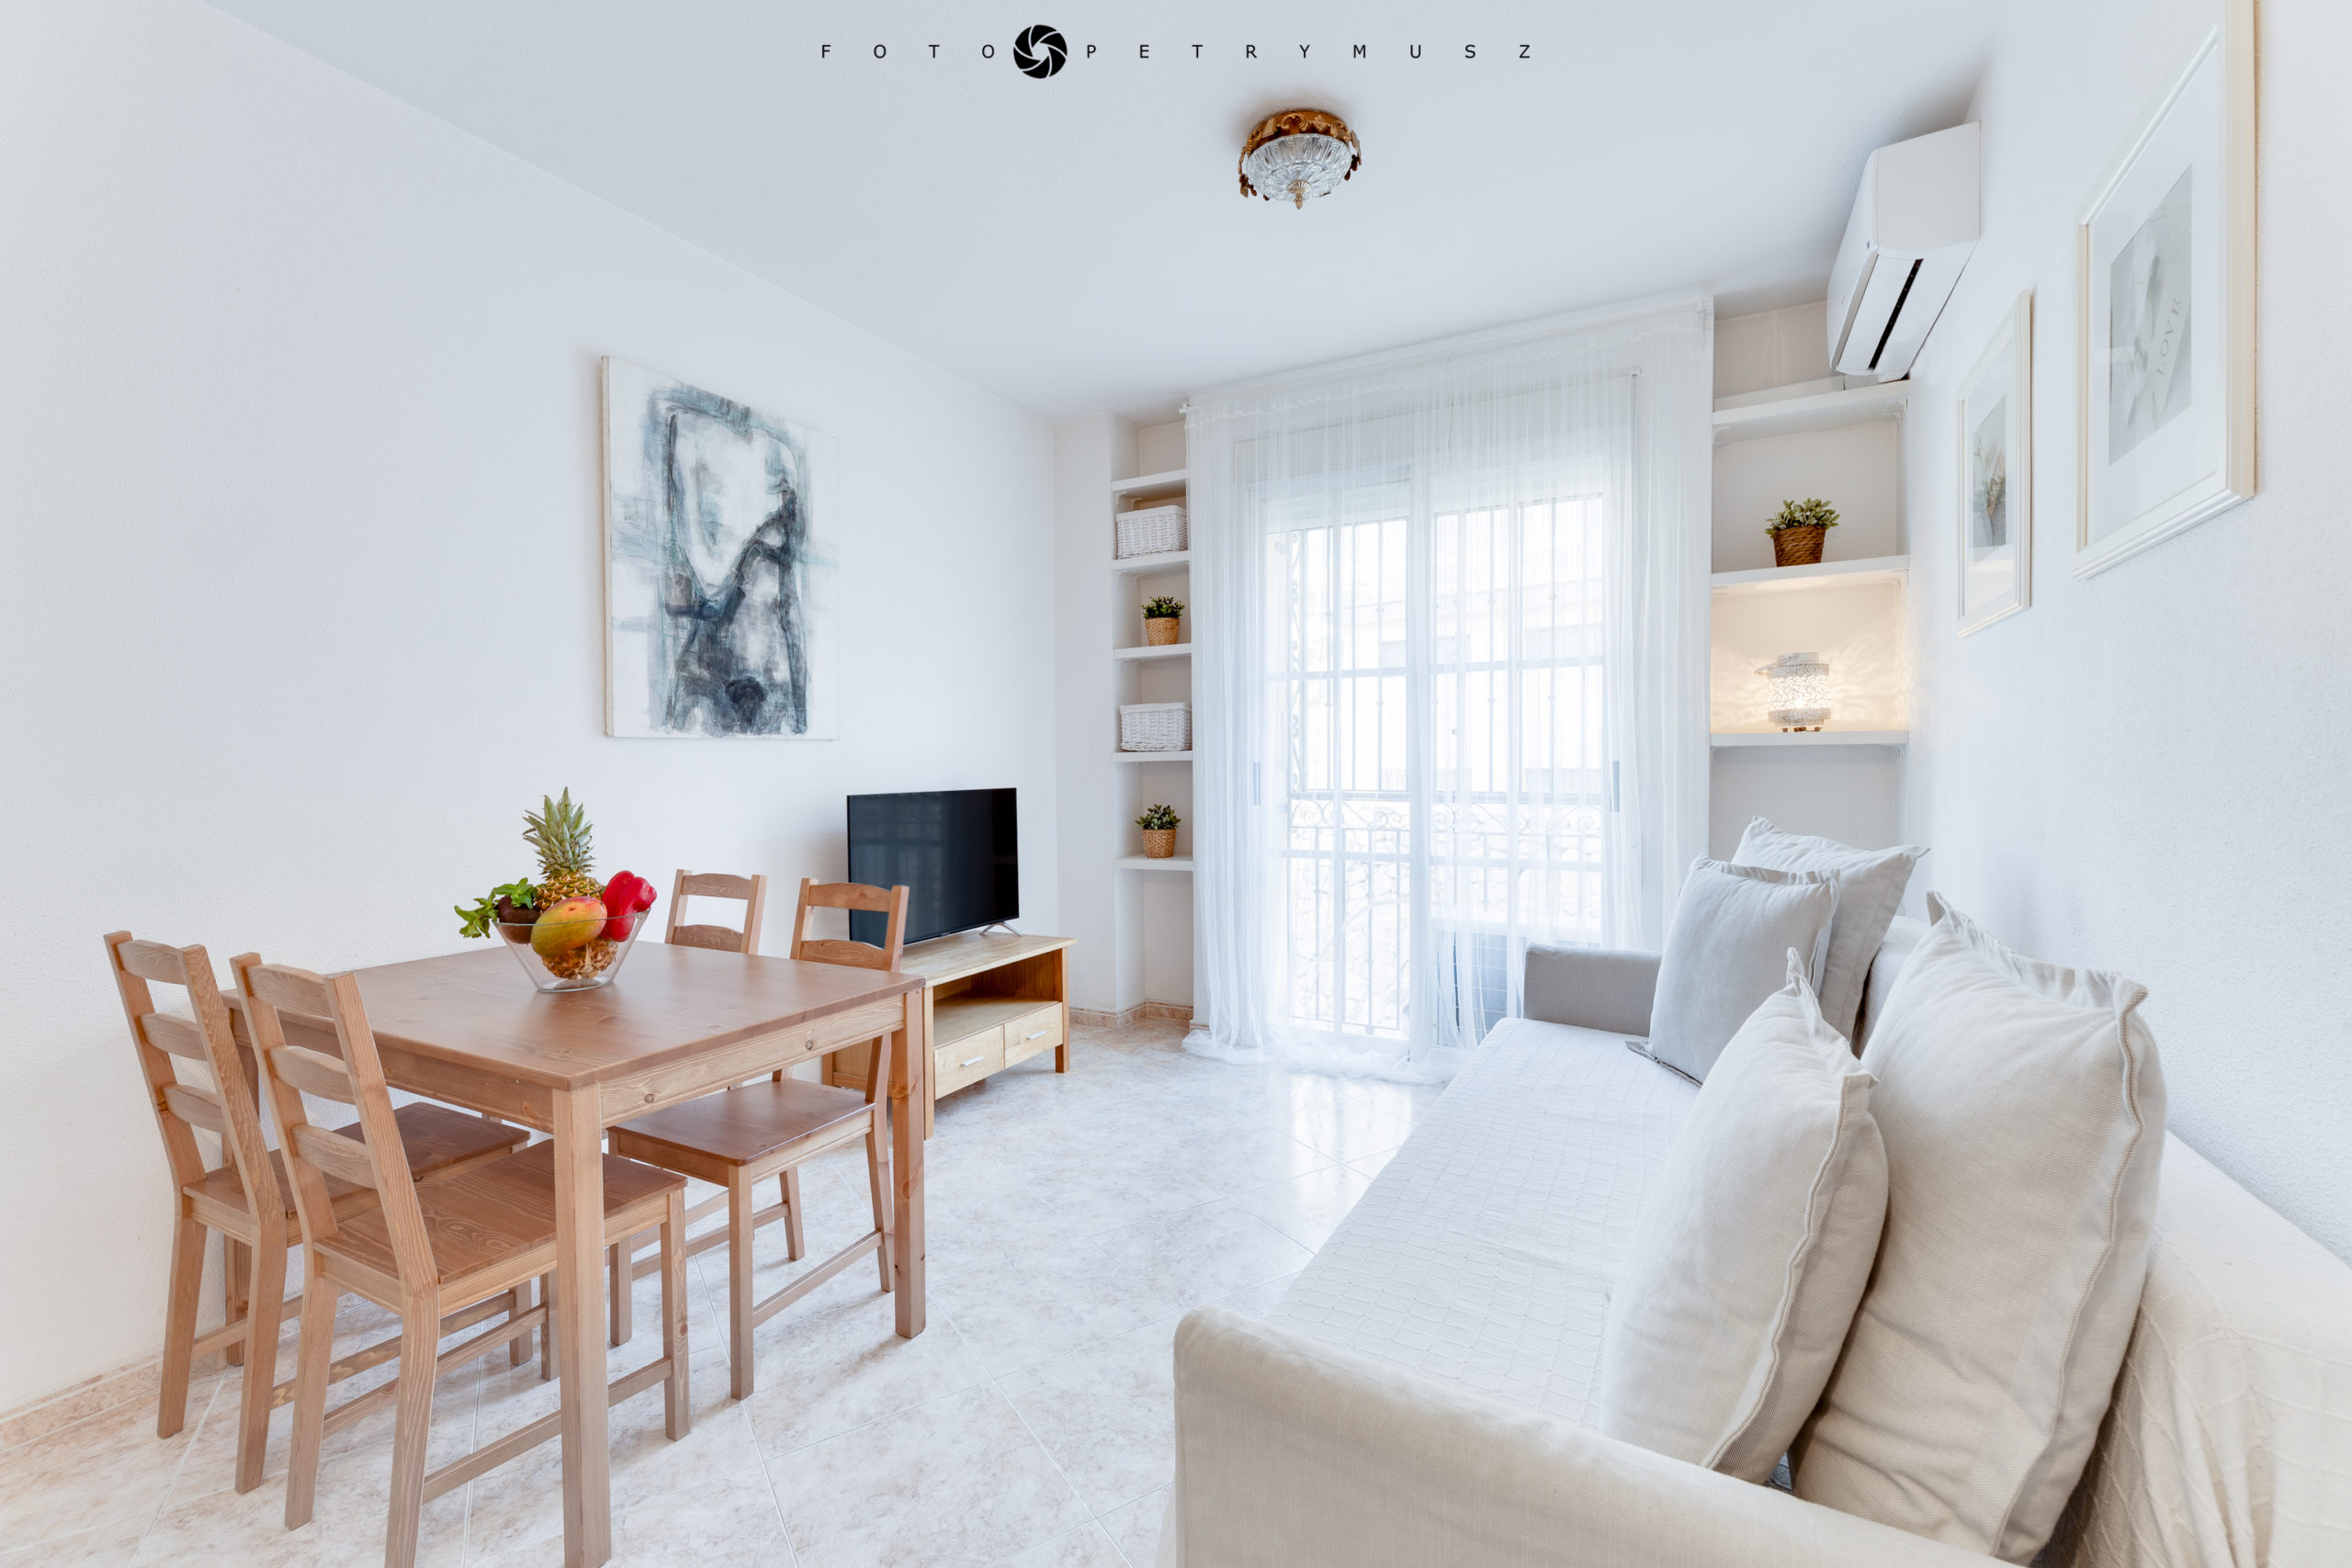 San Cristobal / Apartamento en Alquiler / Alicante